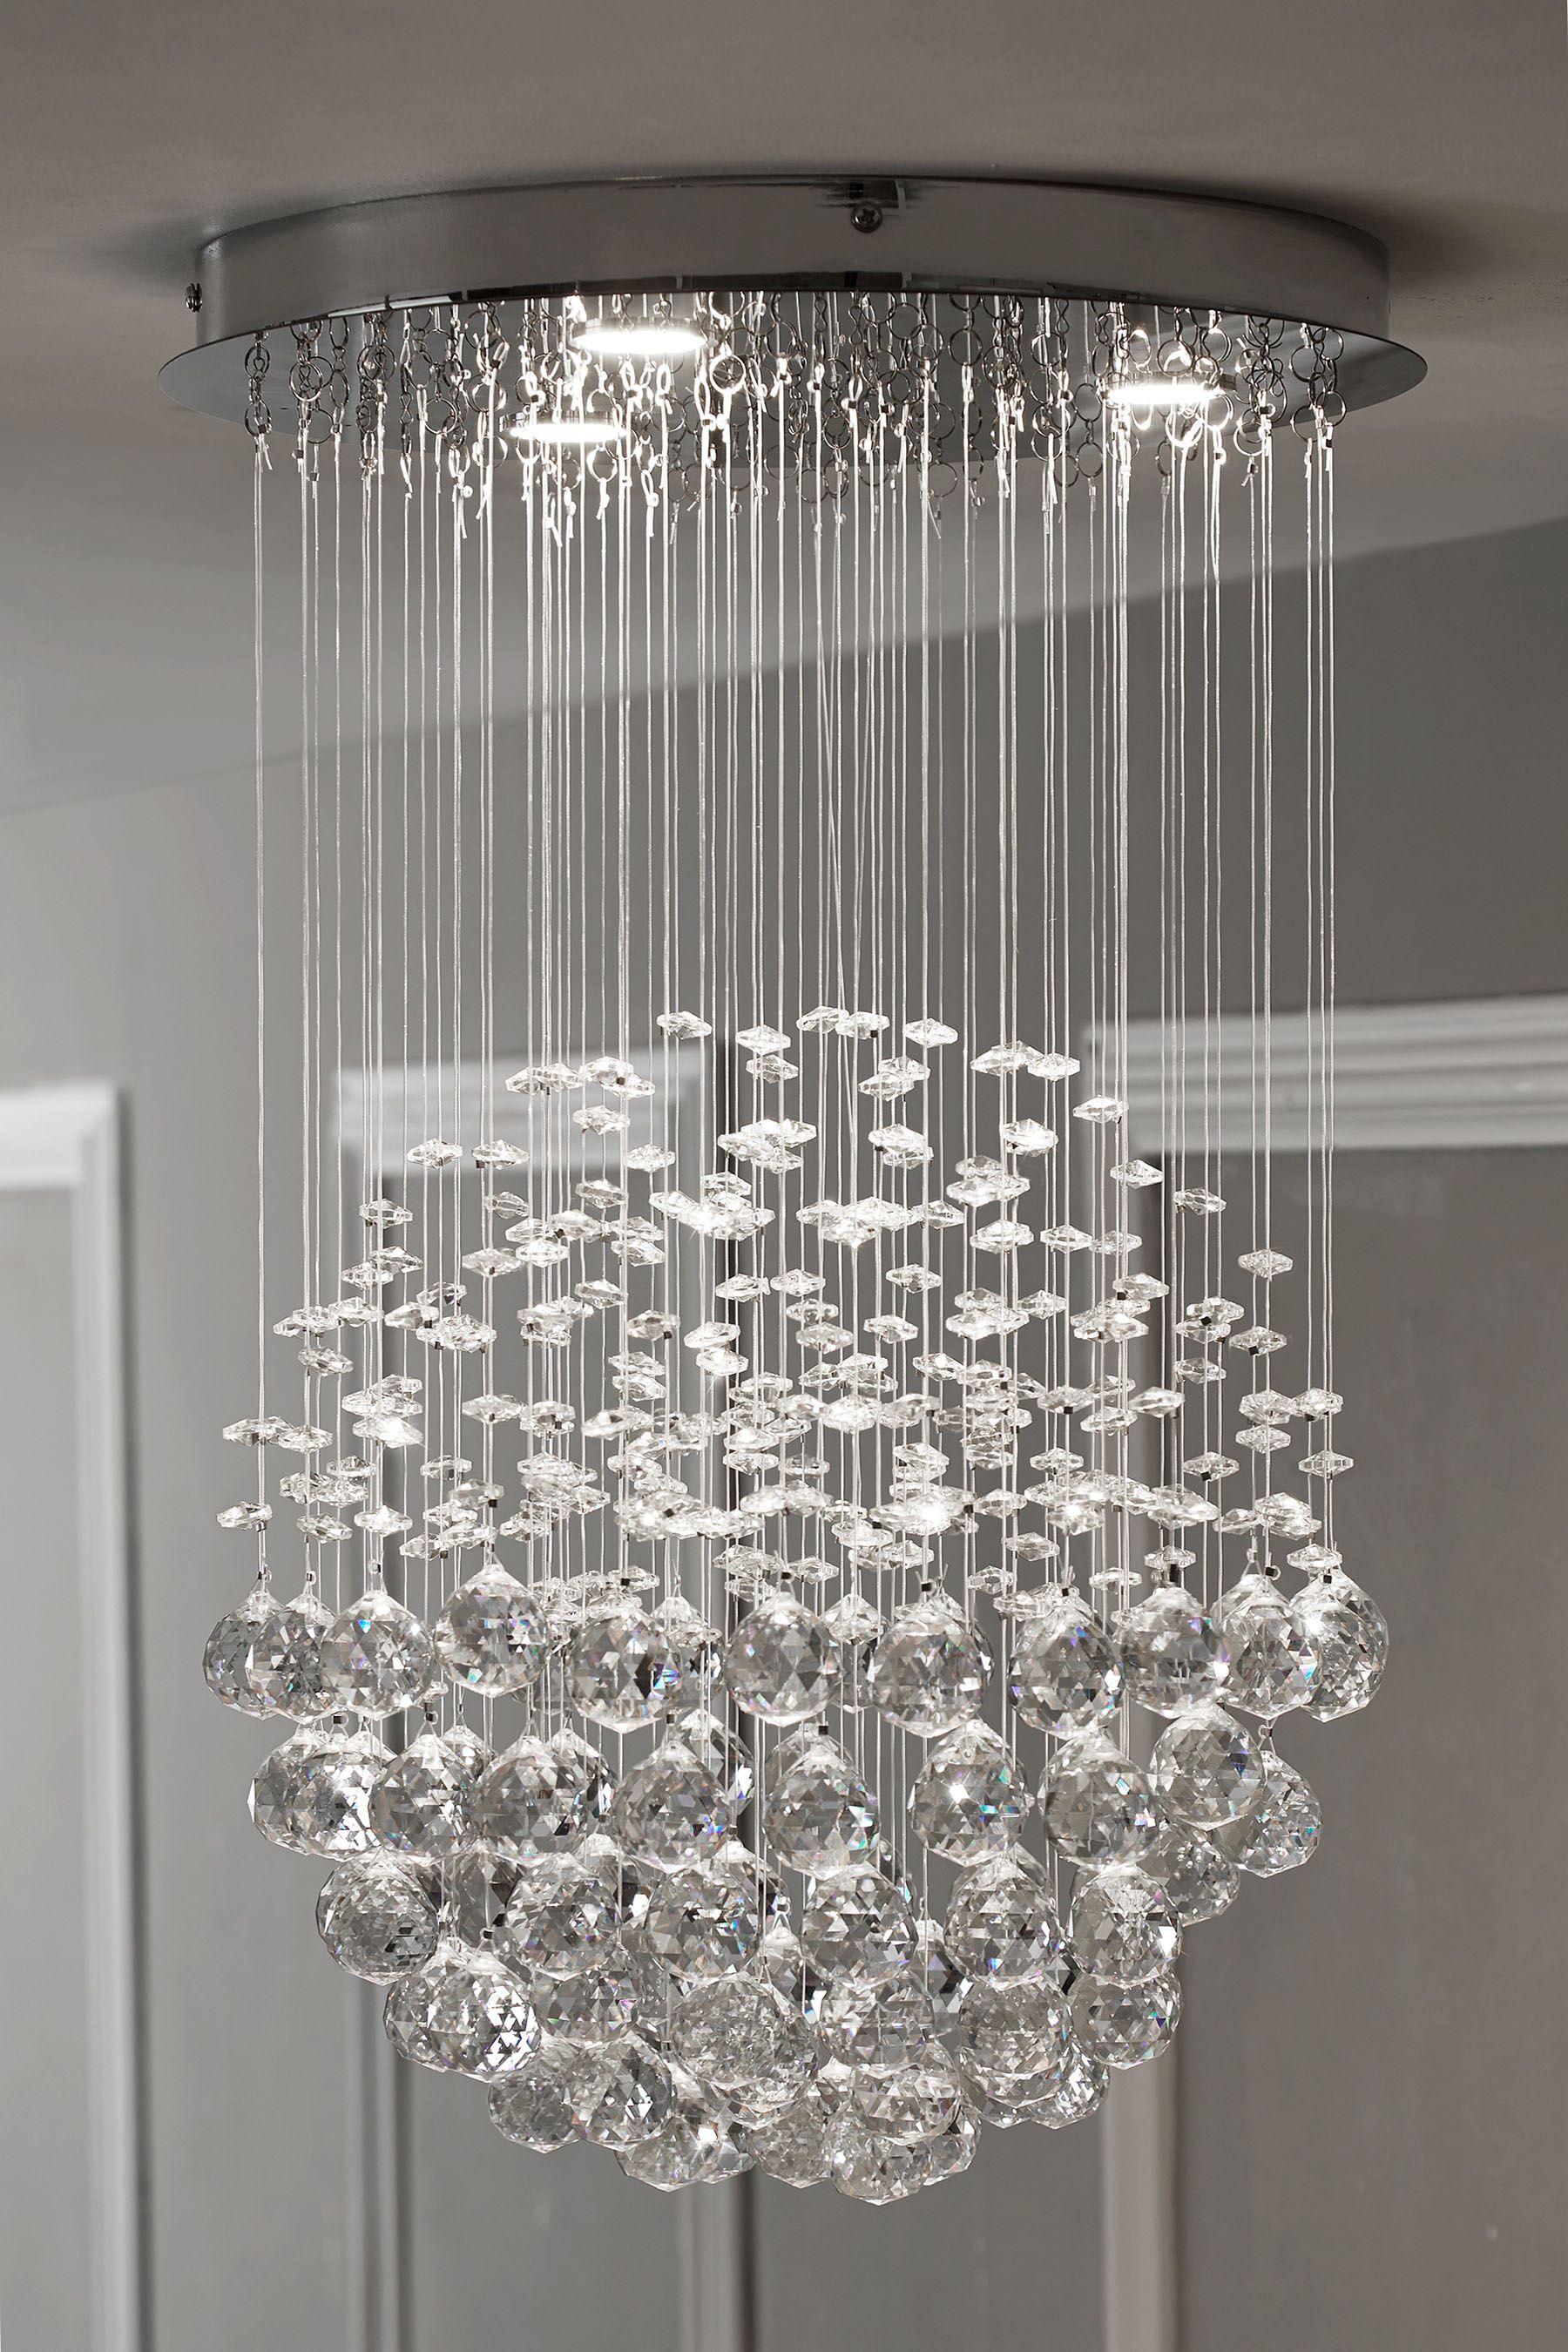 Buy Anastasia Led 3 Light Pendant From The Next Uk Online Shop 3 Light Pendant Pendant Lighting Ceiling Pendant Lights